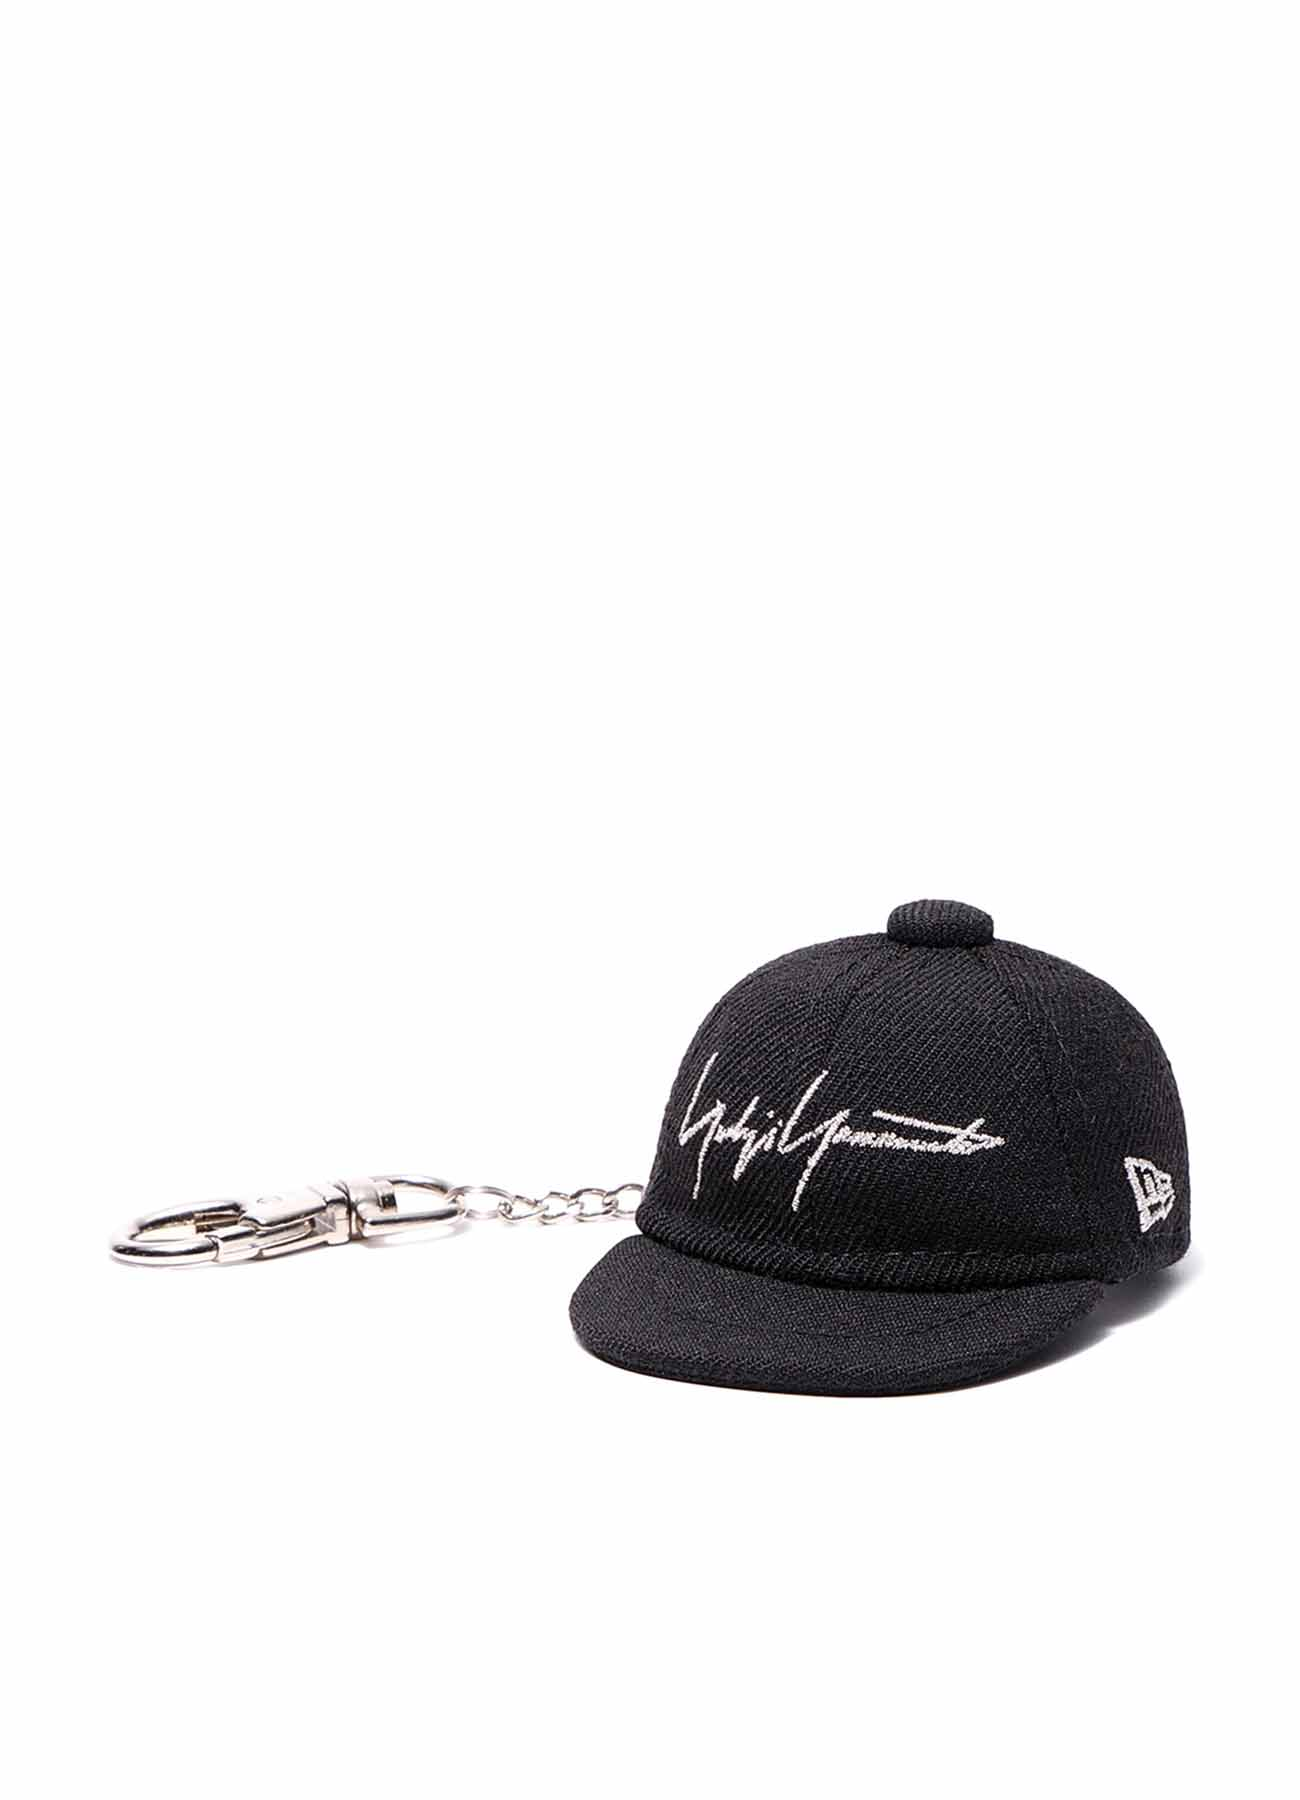 Yohji Yamamoto × New Era BLACK SERGE CAP KEYHOLDER BLACK/SILVER